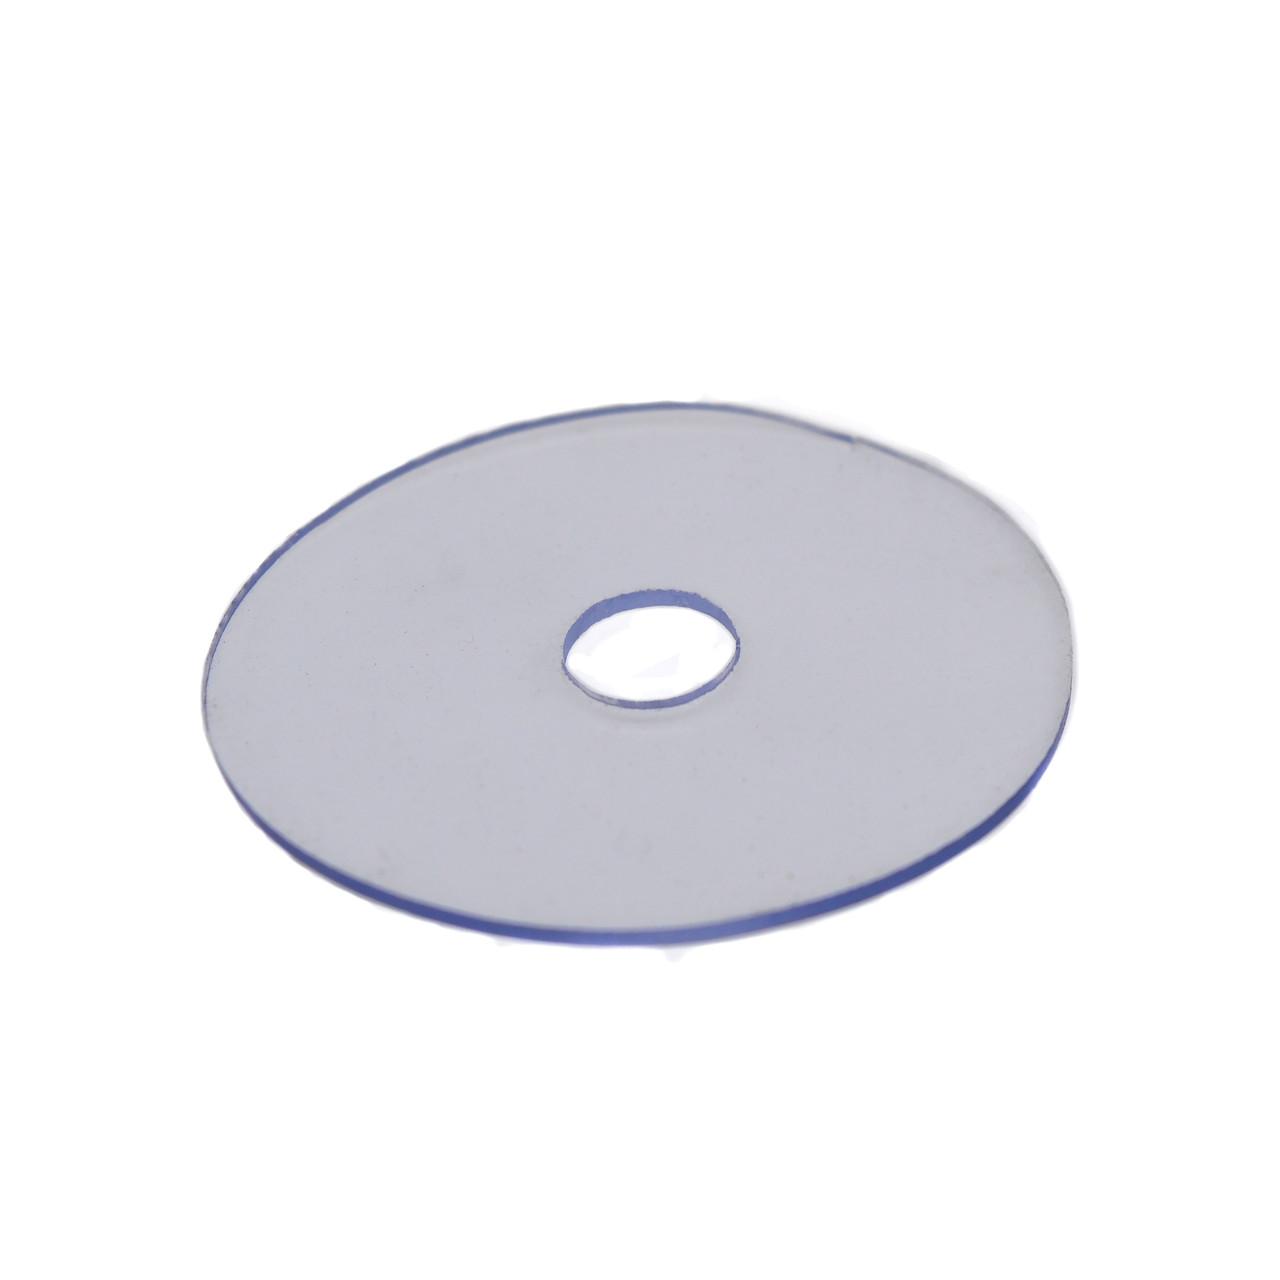 ODF-11-09-08  прокладка для стеклодержателя ПВХ круглая d38 под резьбу М10